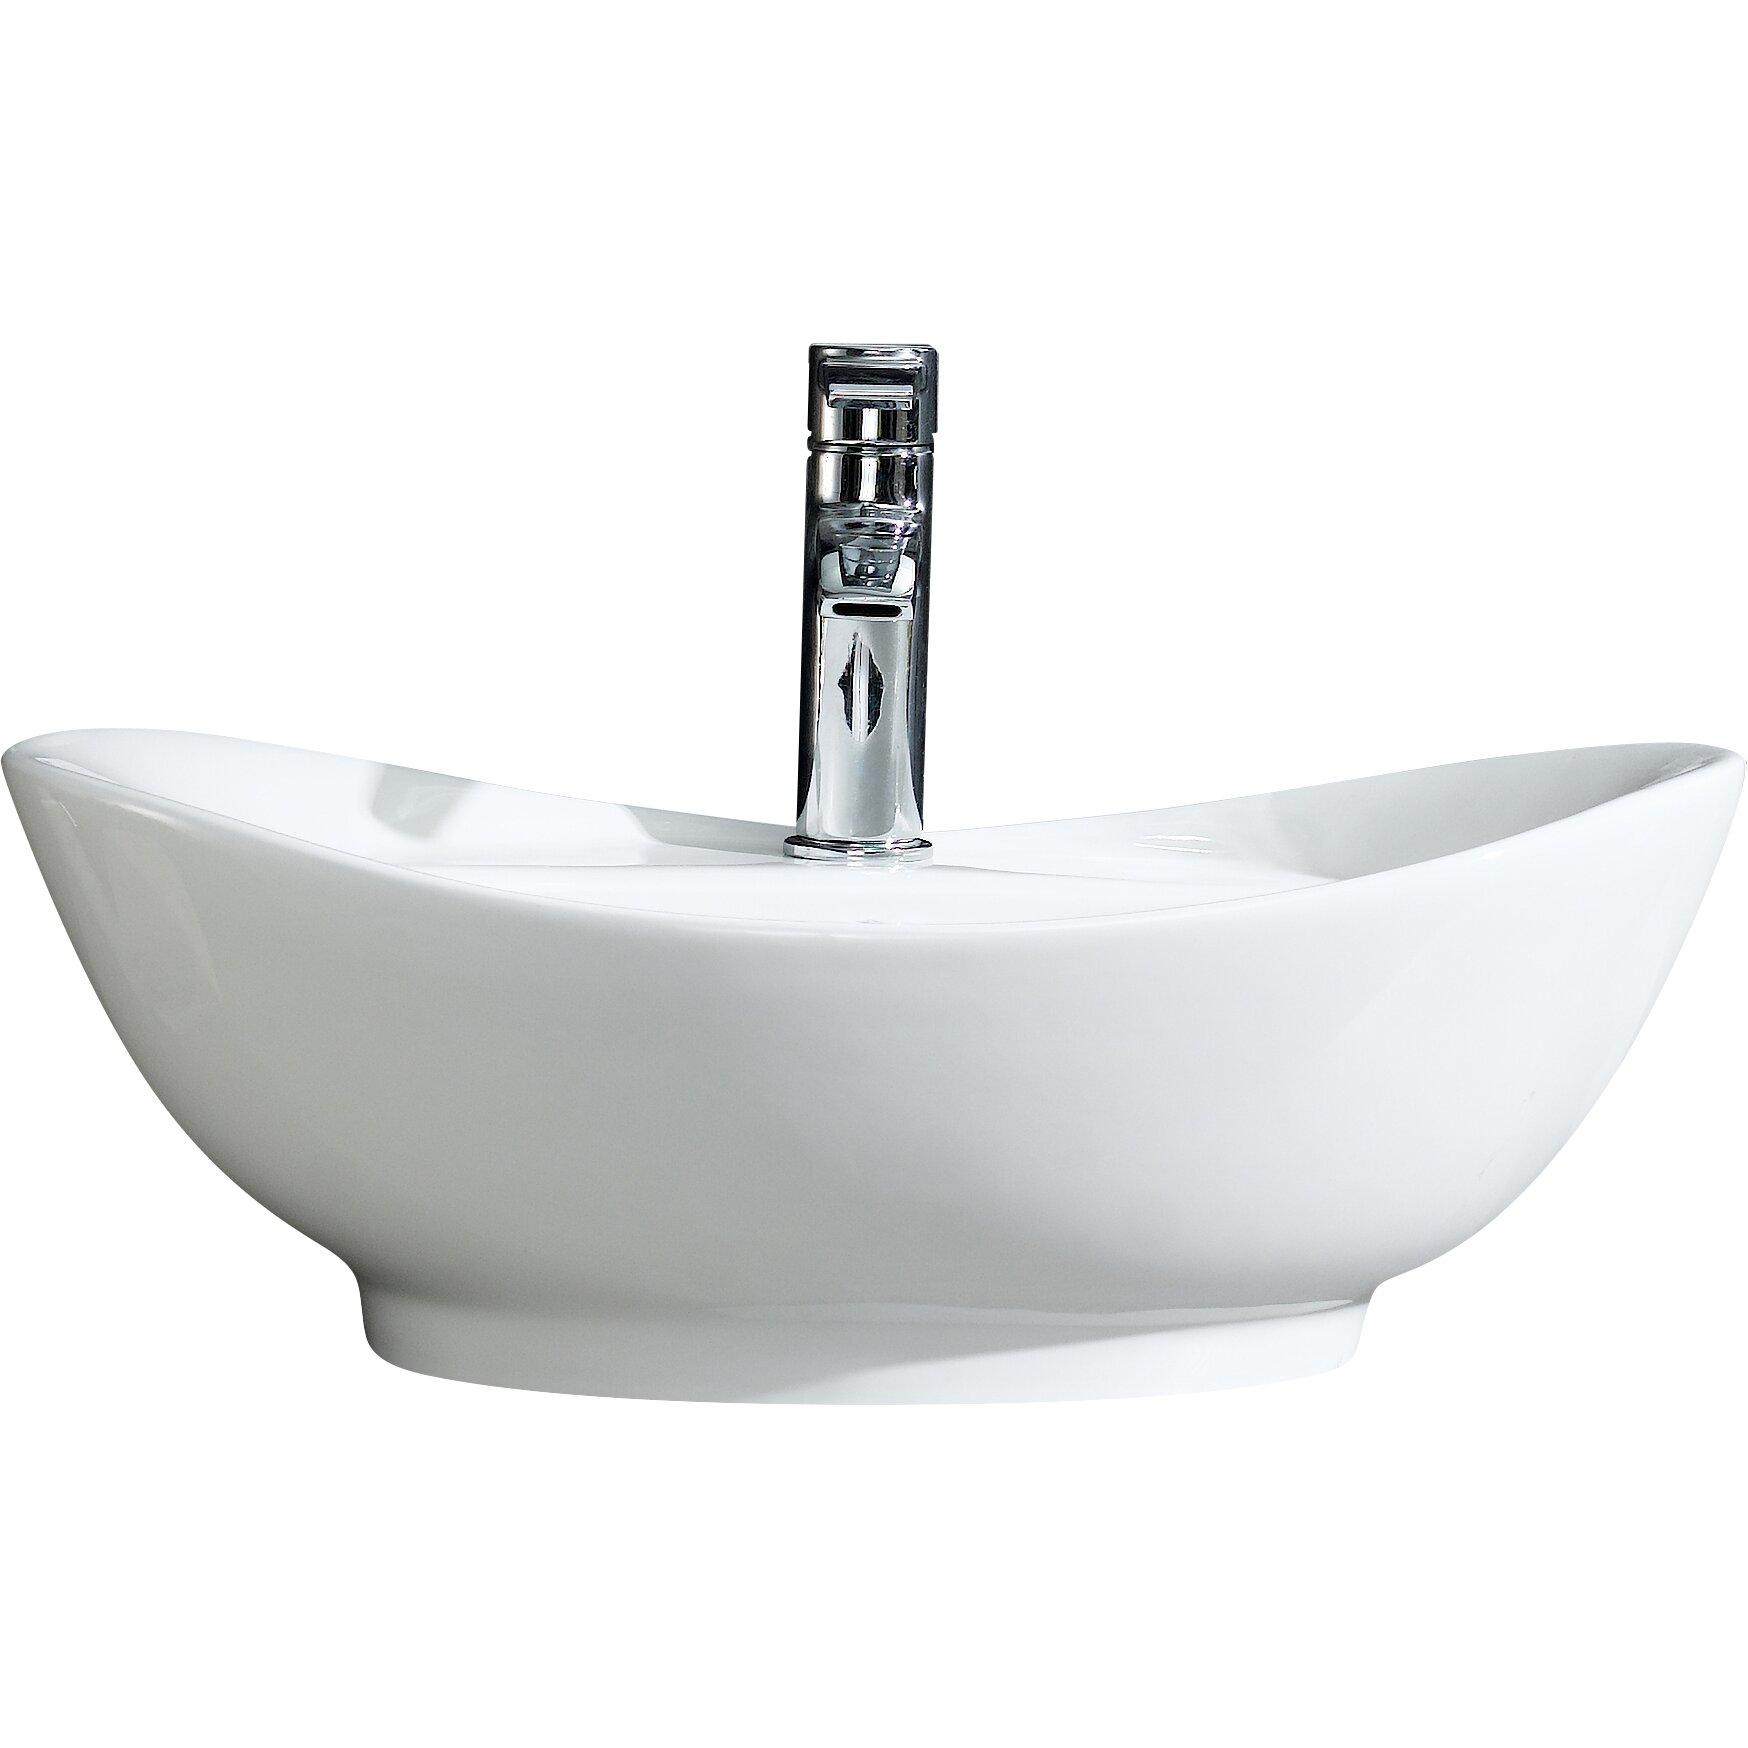 Fine Fixtures Modern Vitreous Large Oval Vessel Bathroom